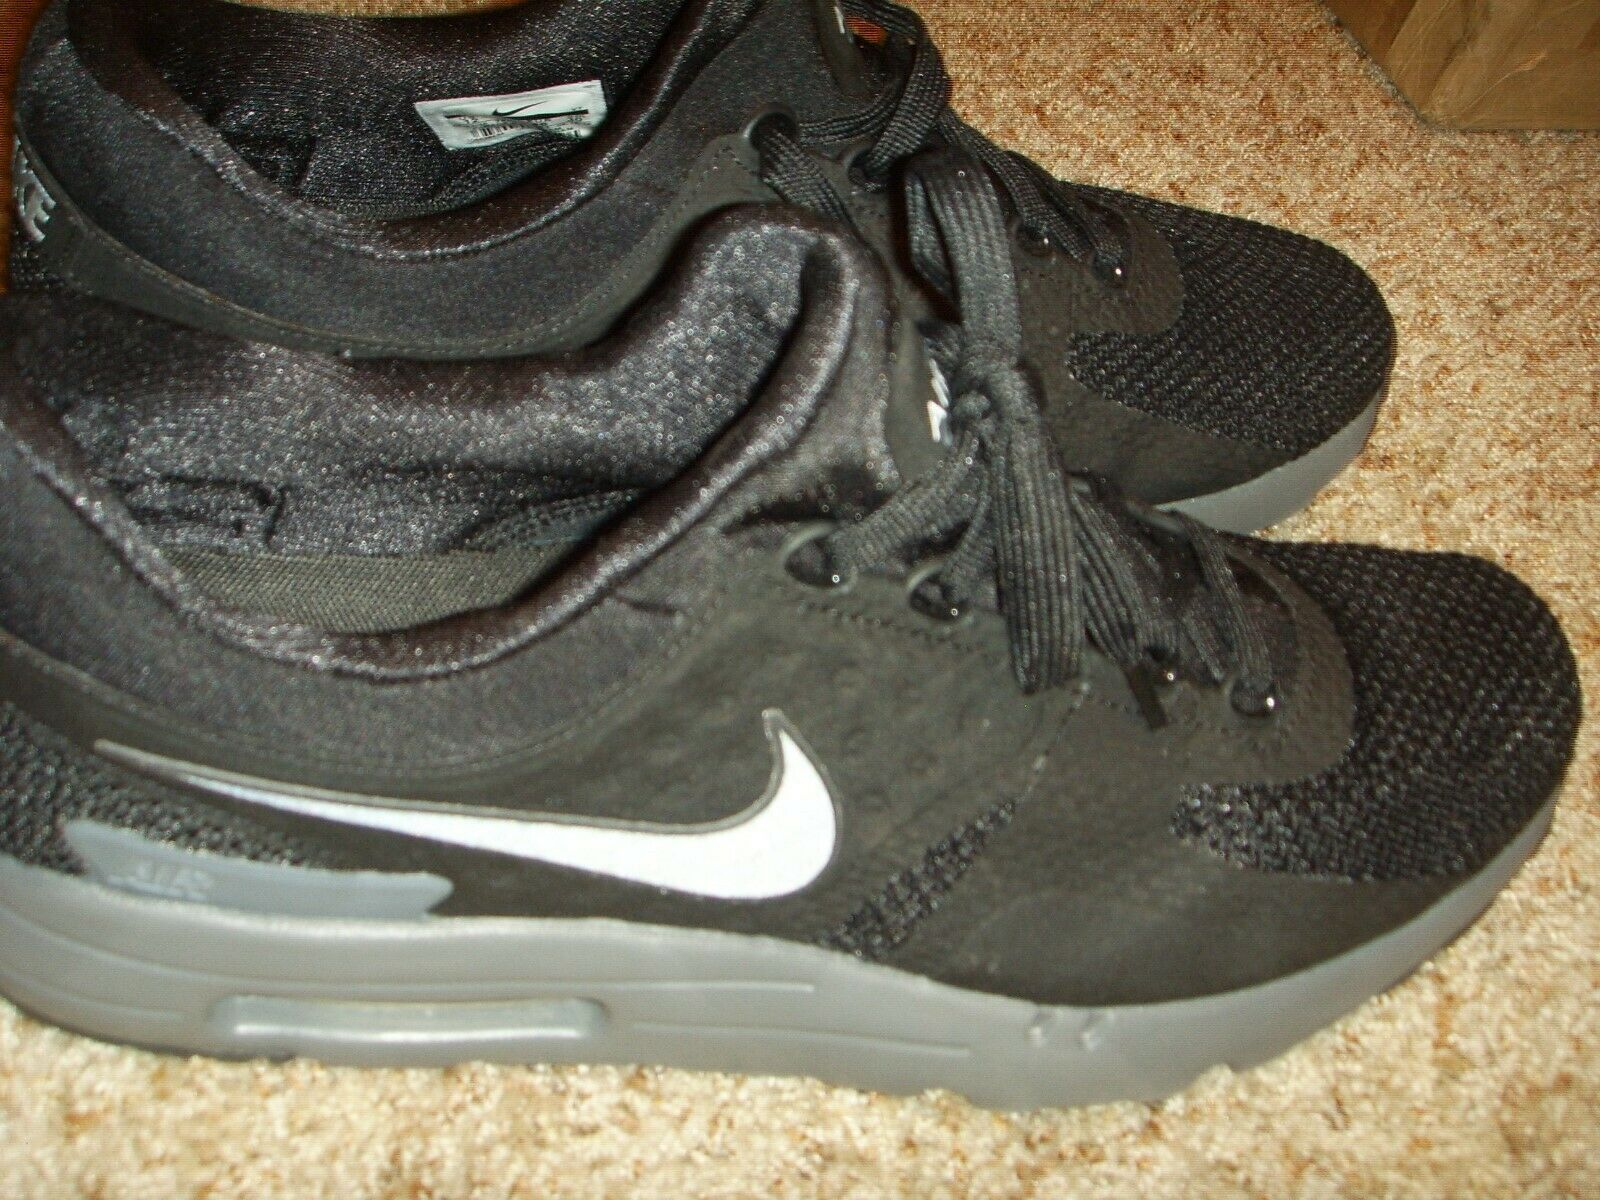 best website 3f279 83103 Nike Air Max Zero QS 789695-001 Mens Size 12 12 12 8e7f0a ...